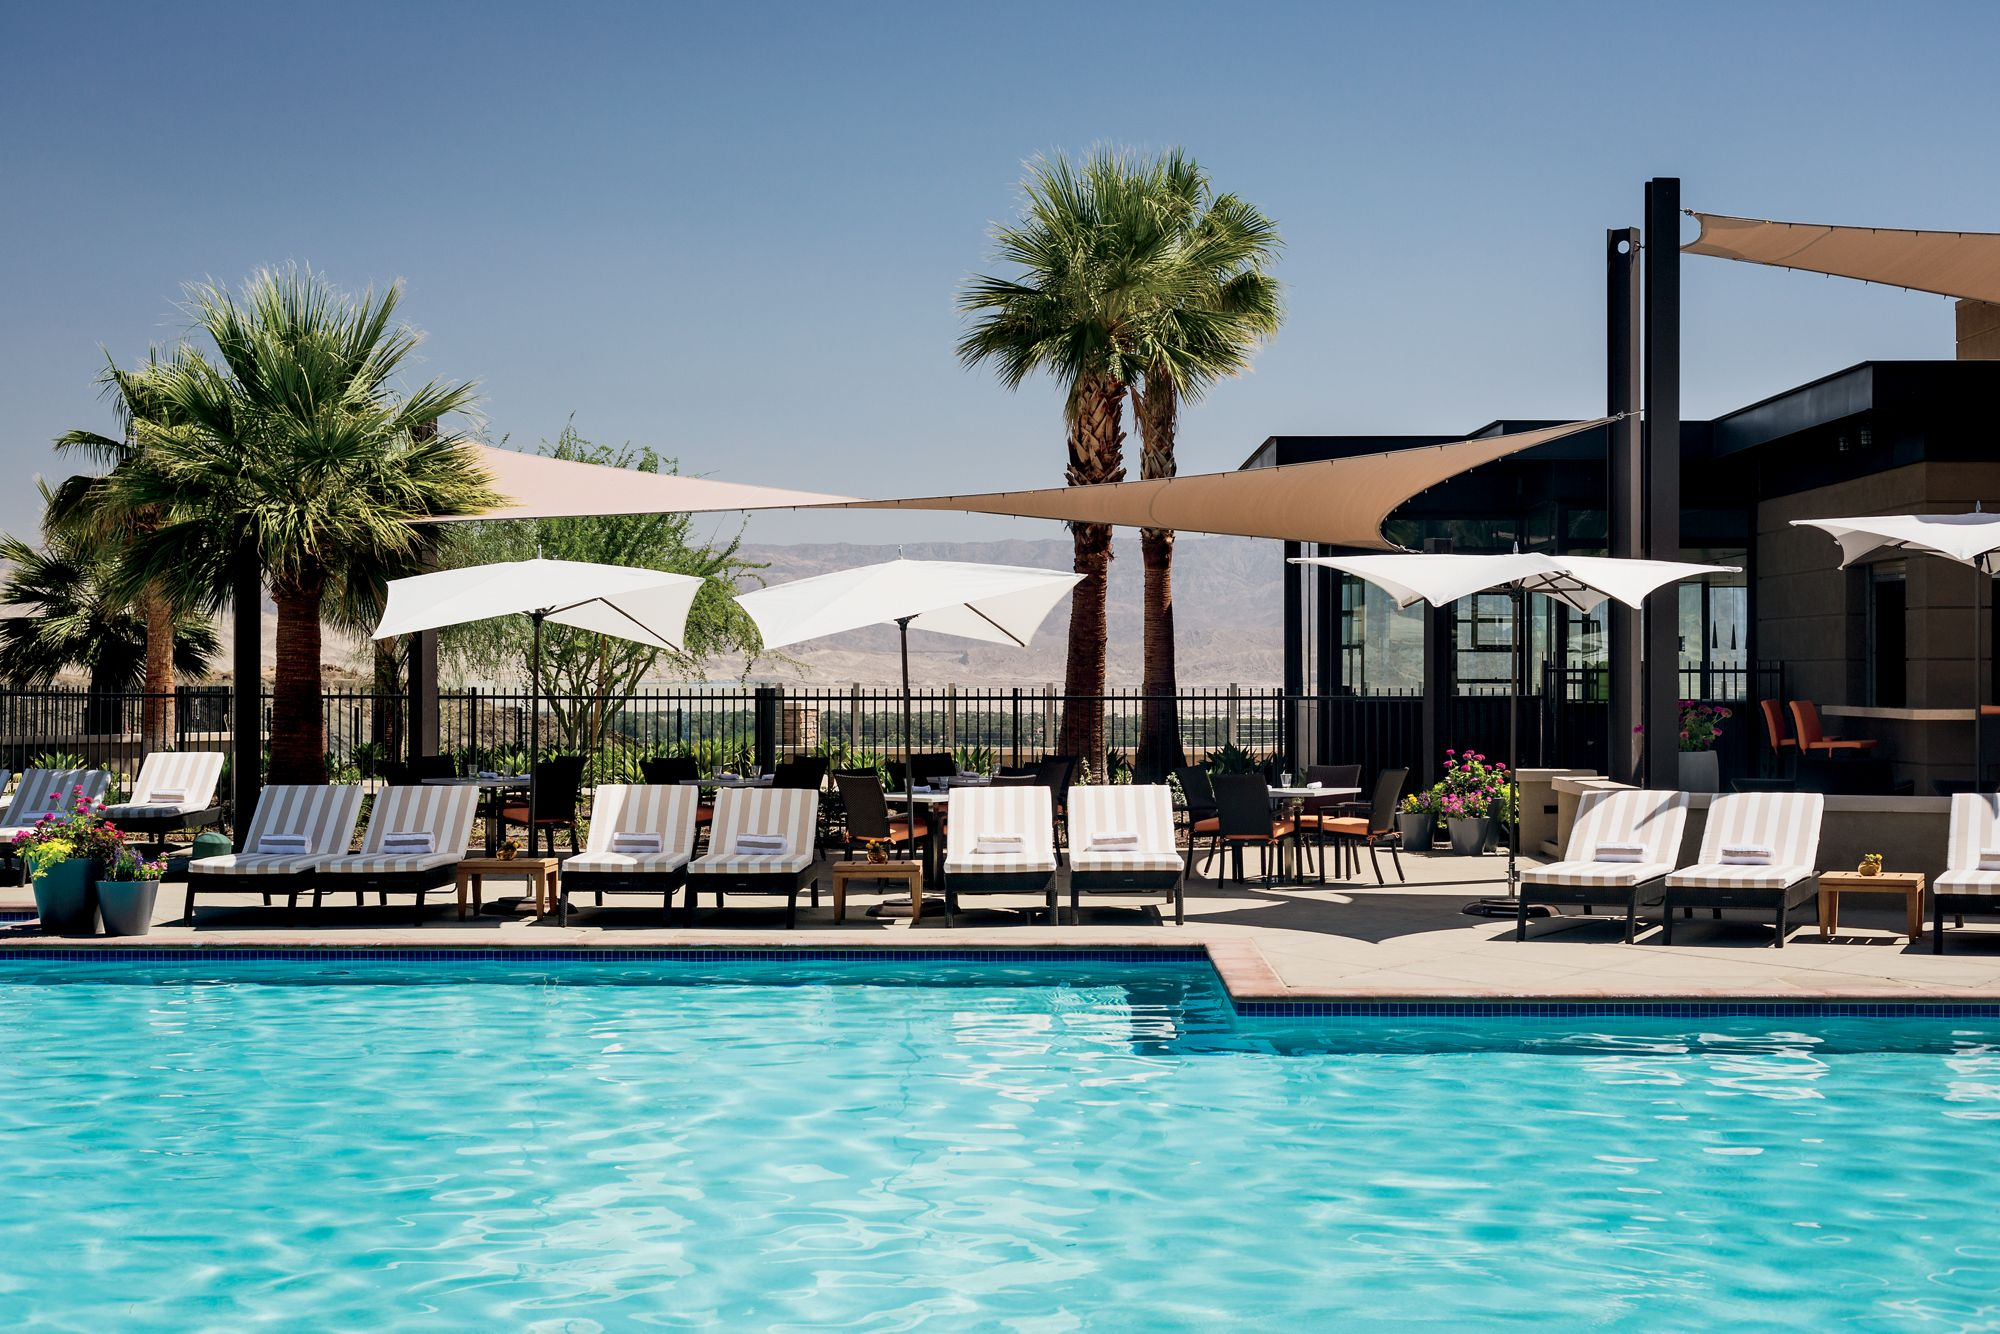 Resort Pools The Ritz Carlton Rancho Mirage